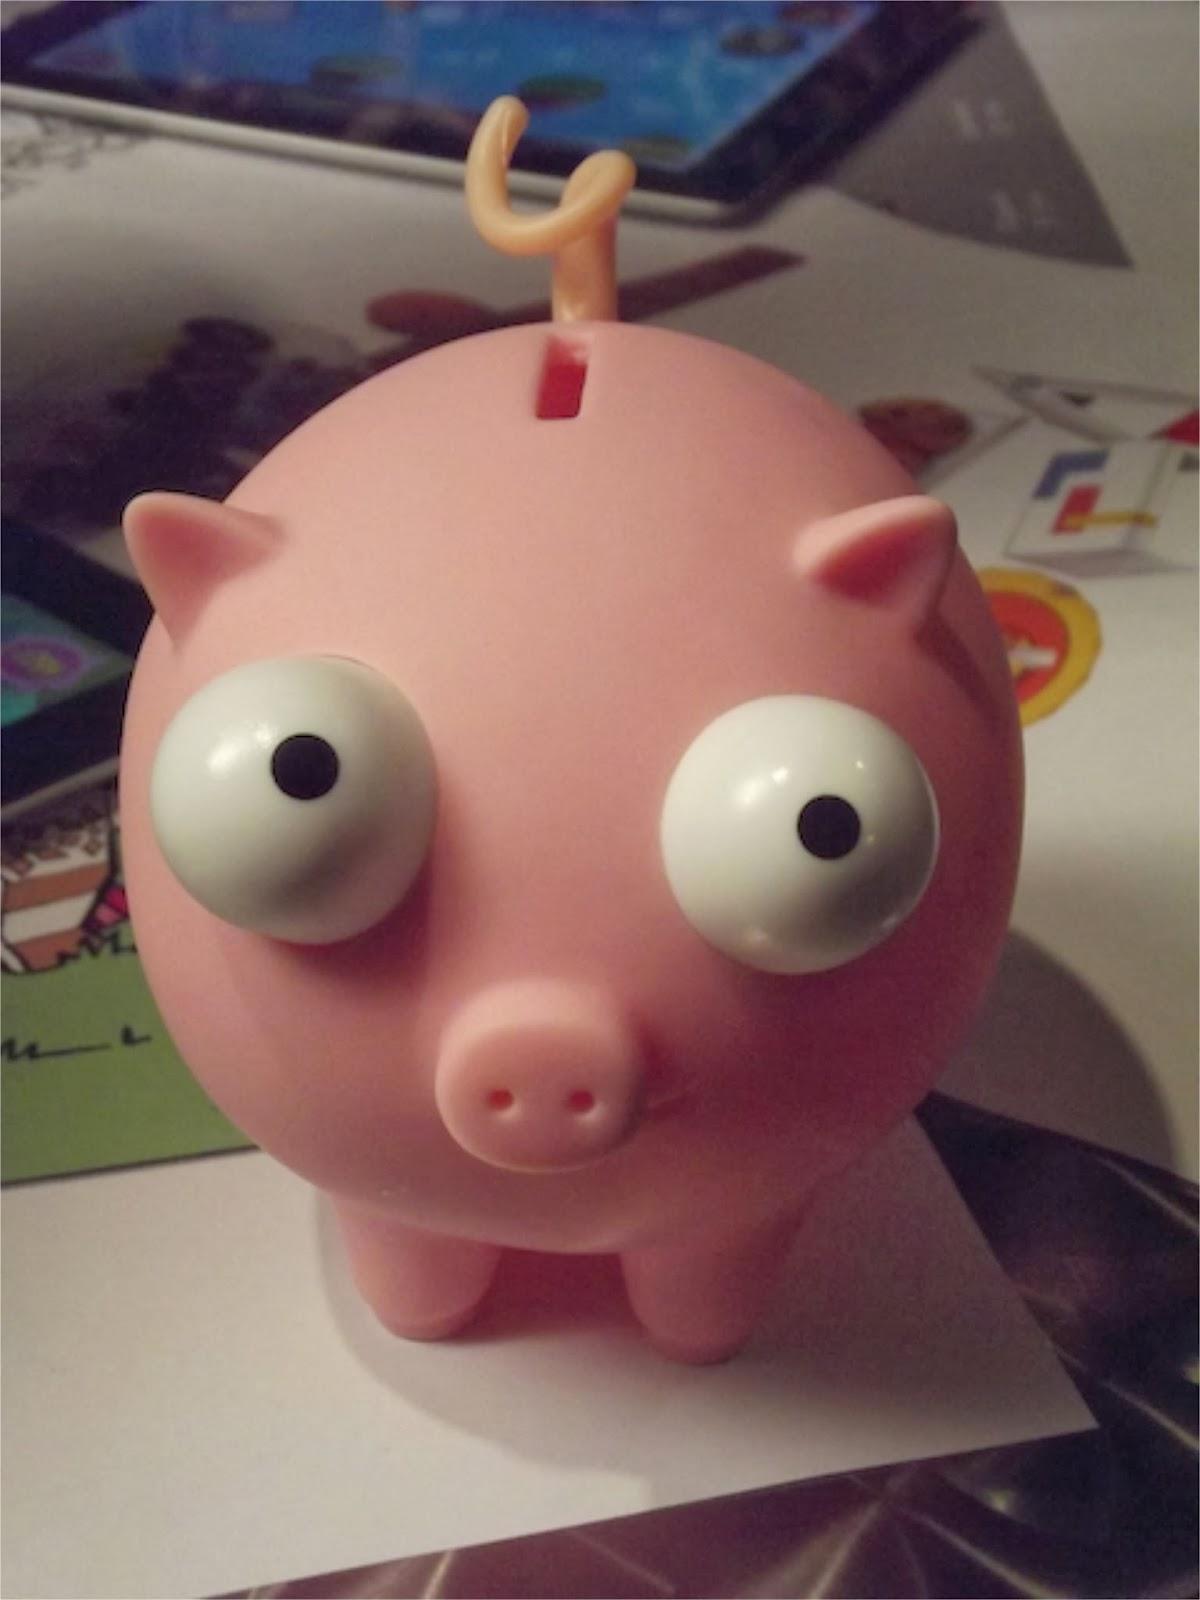 NatWest Pigby piggy bank